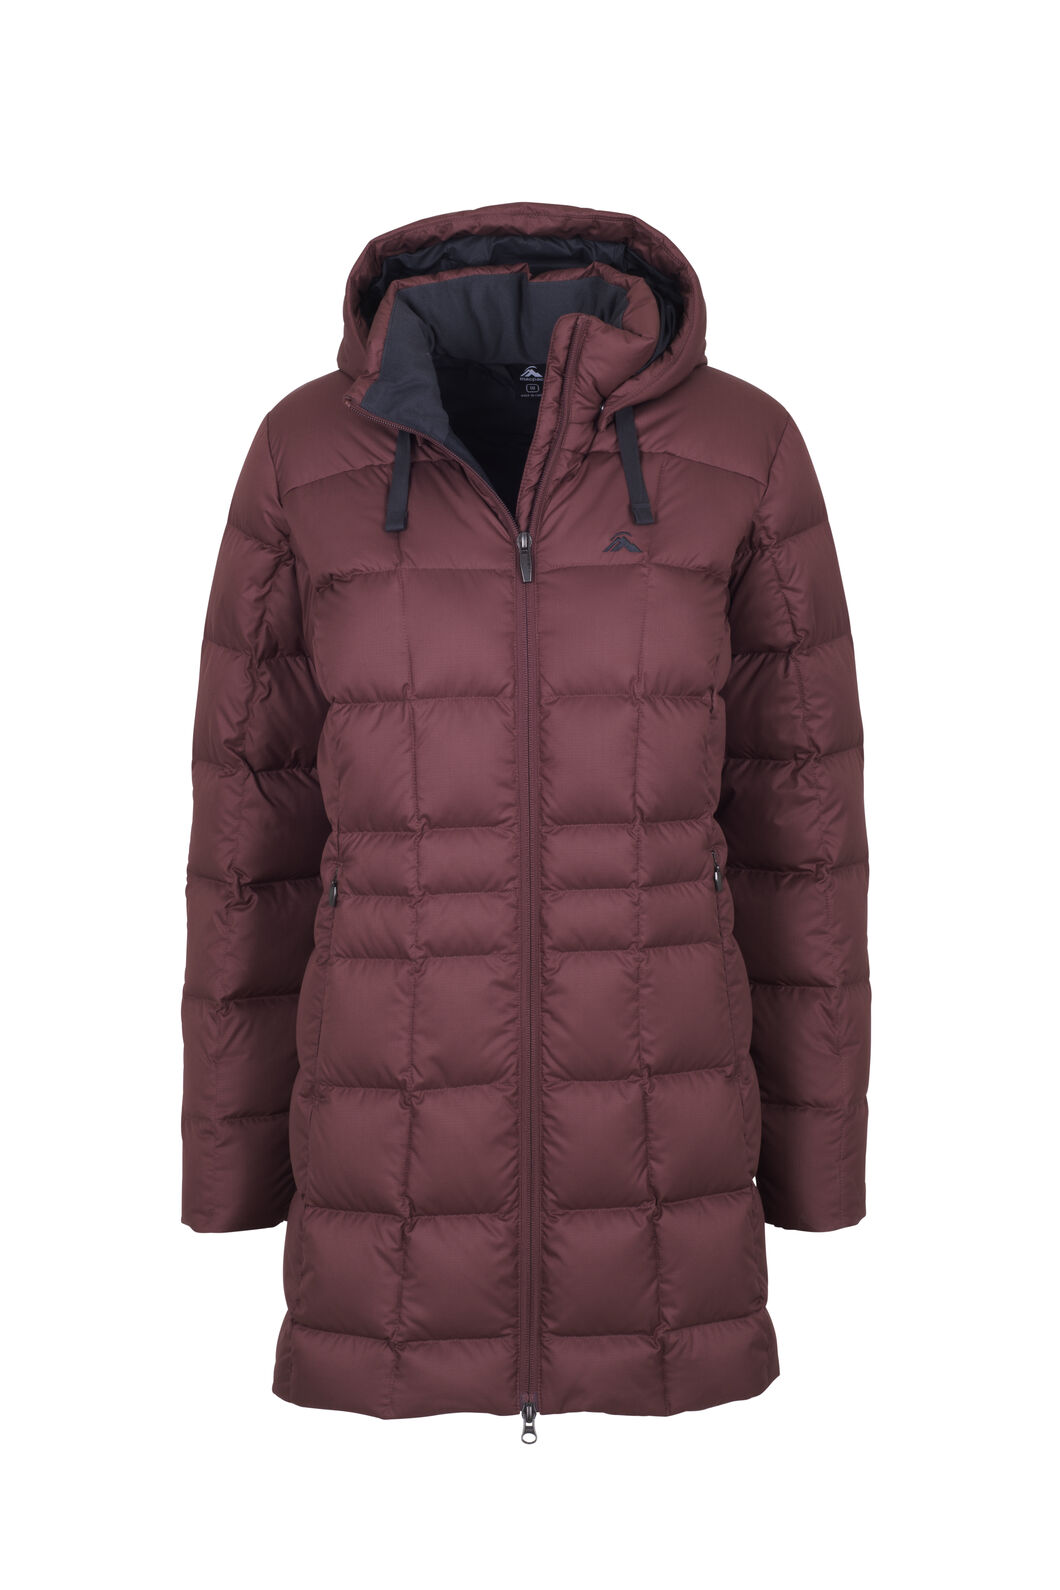 45c34abab87a Macpac Aurora Down Coat V3 - Women s